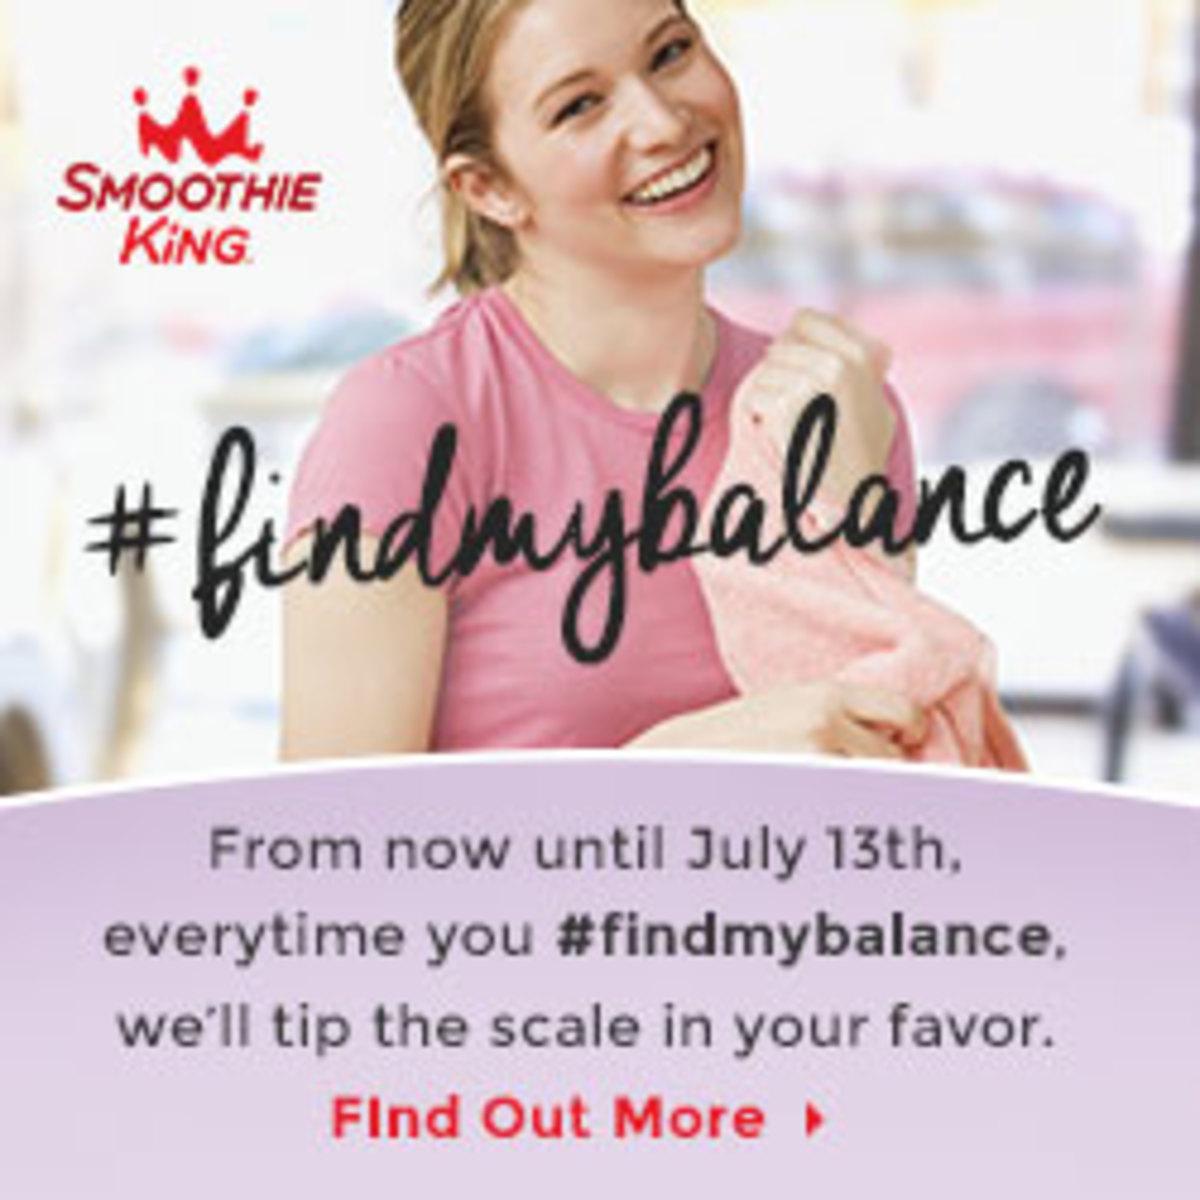 Smoothie King #findmybalance